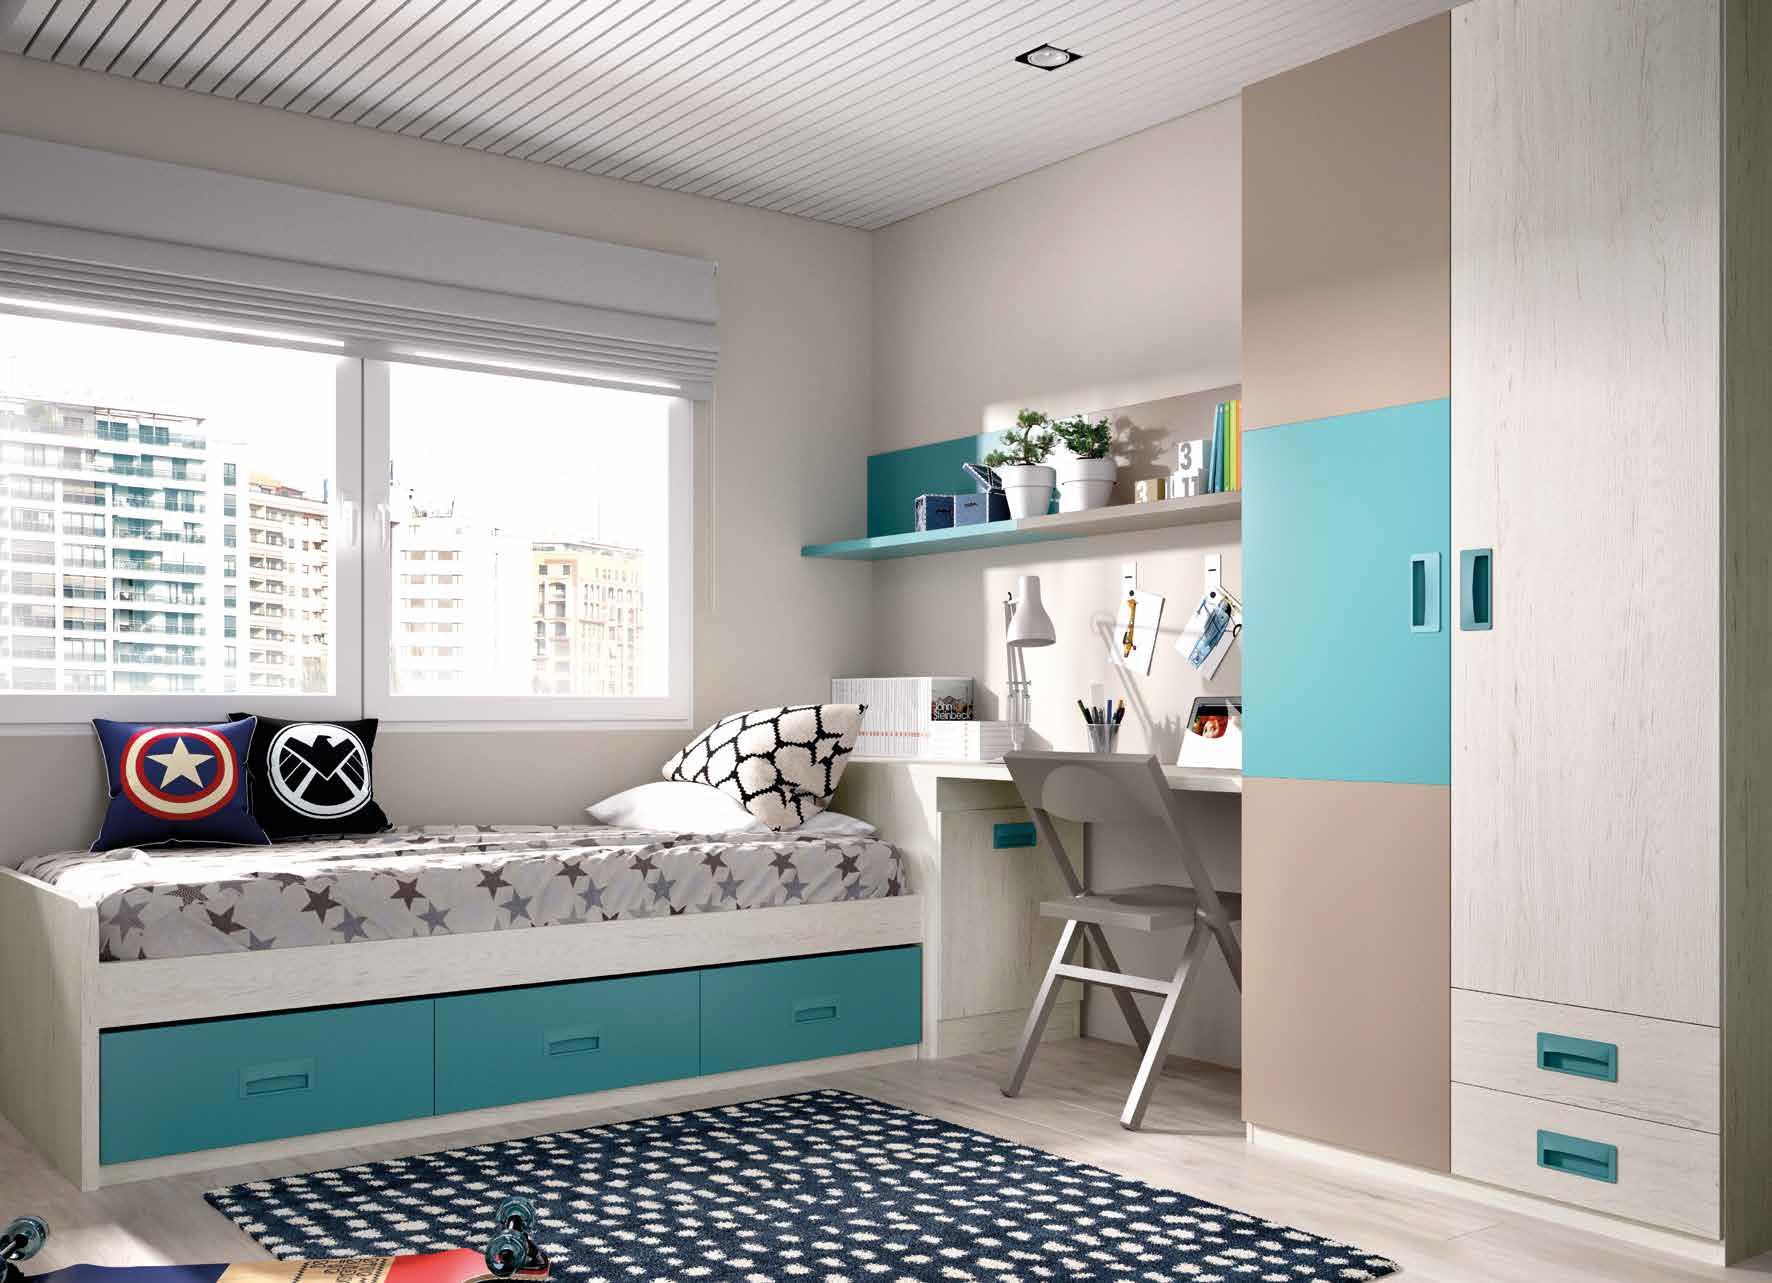 nidos-One-19-muebles-paco-caballero-512-5ccc1705886b6